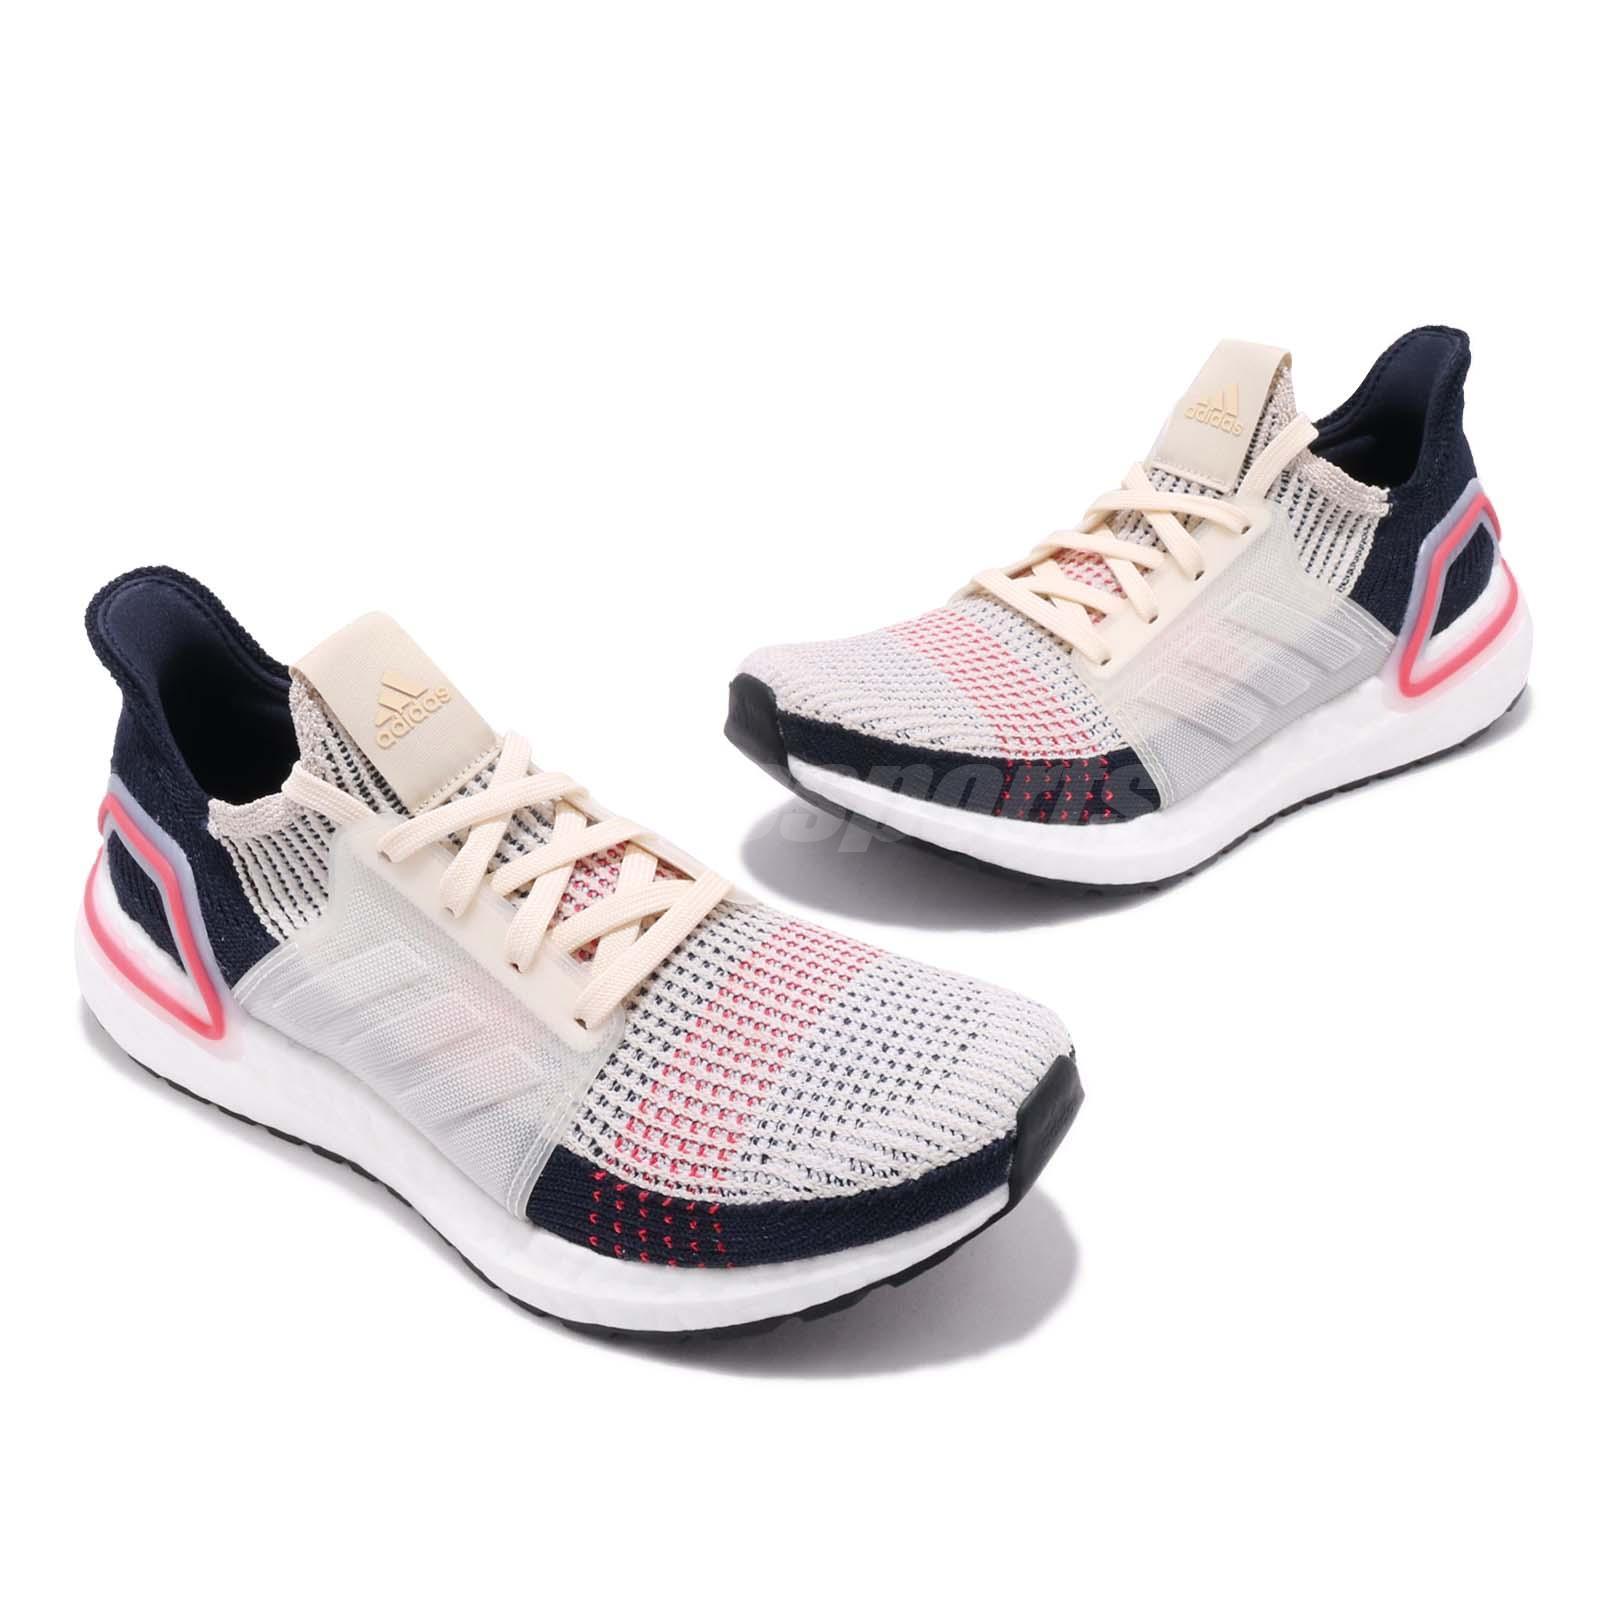 26b2644cc adidas UltraBoost 19 Clear Brown Legend Ink Women Running Shoes ...